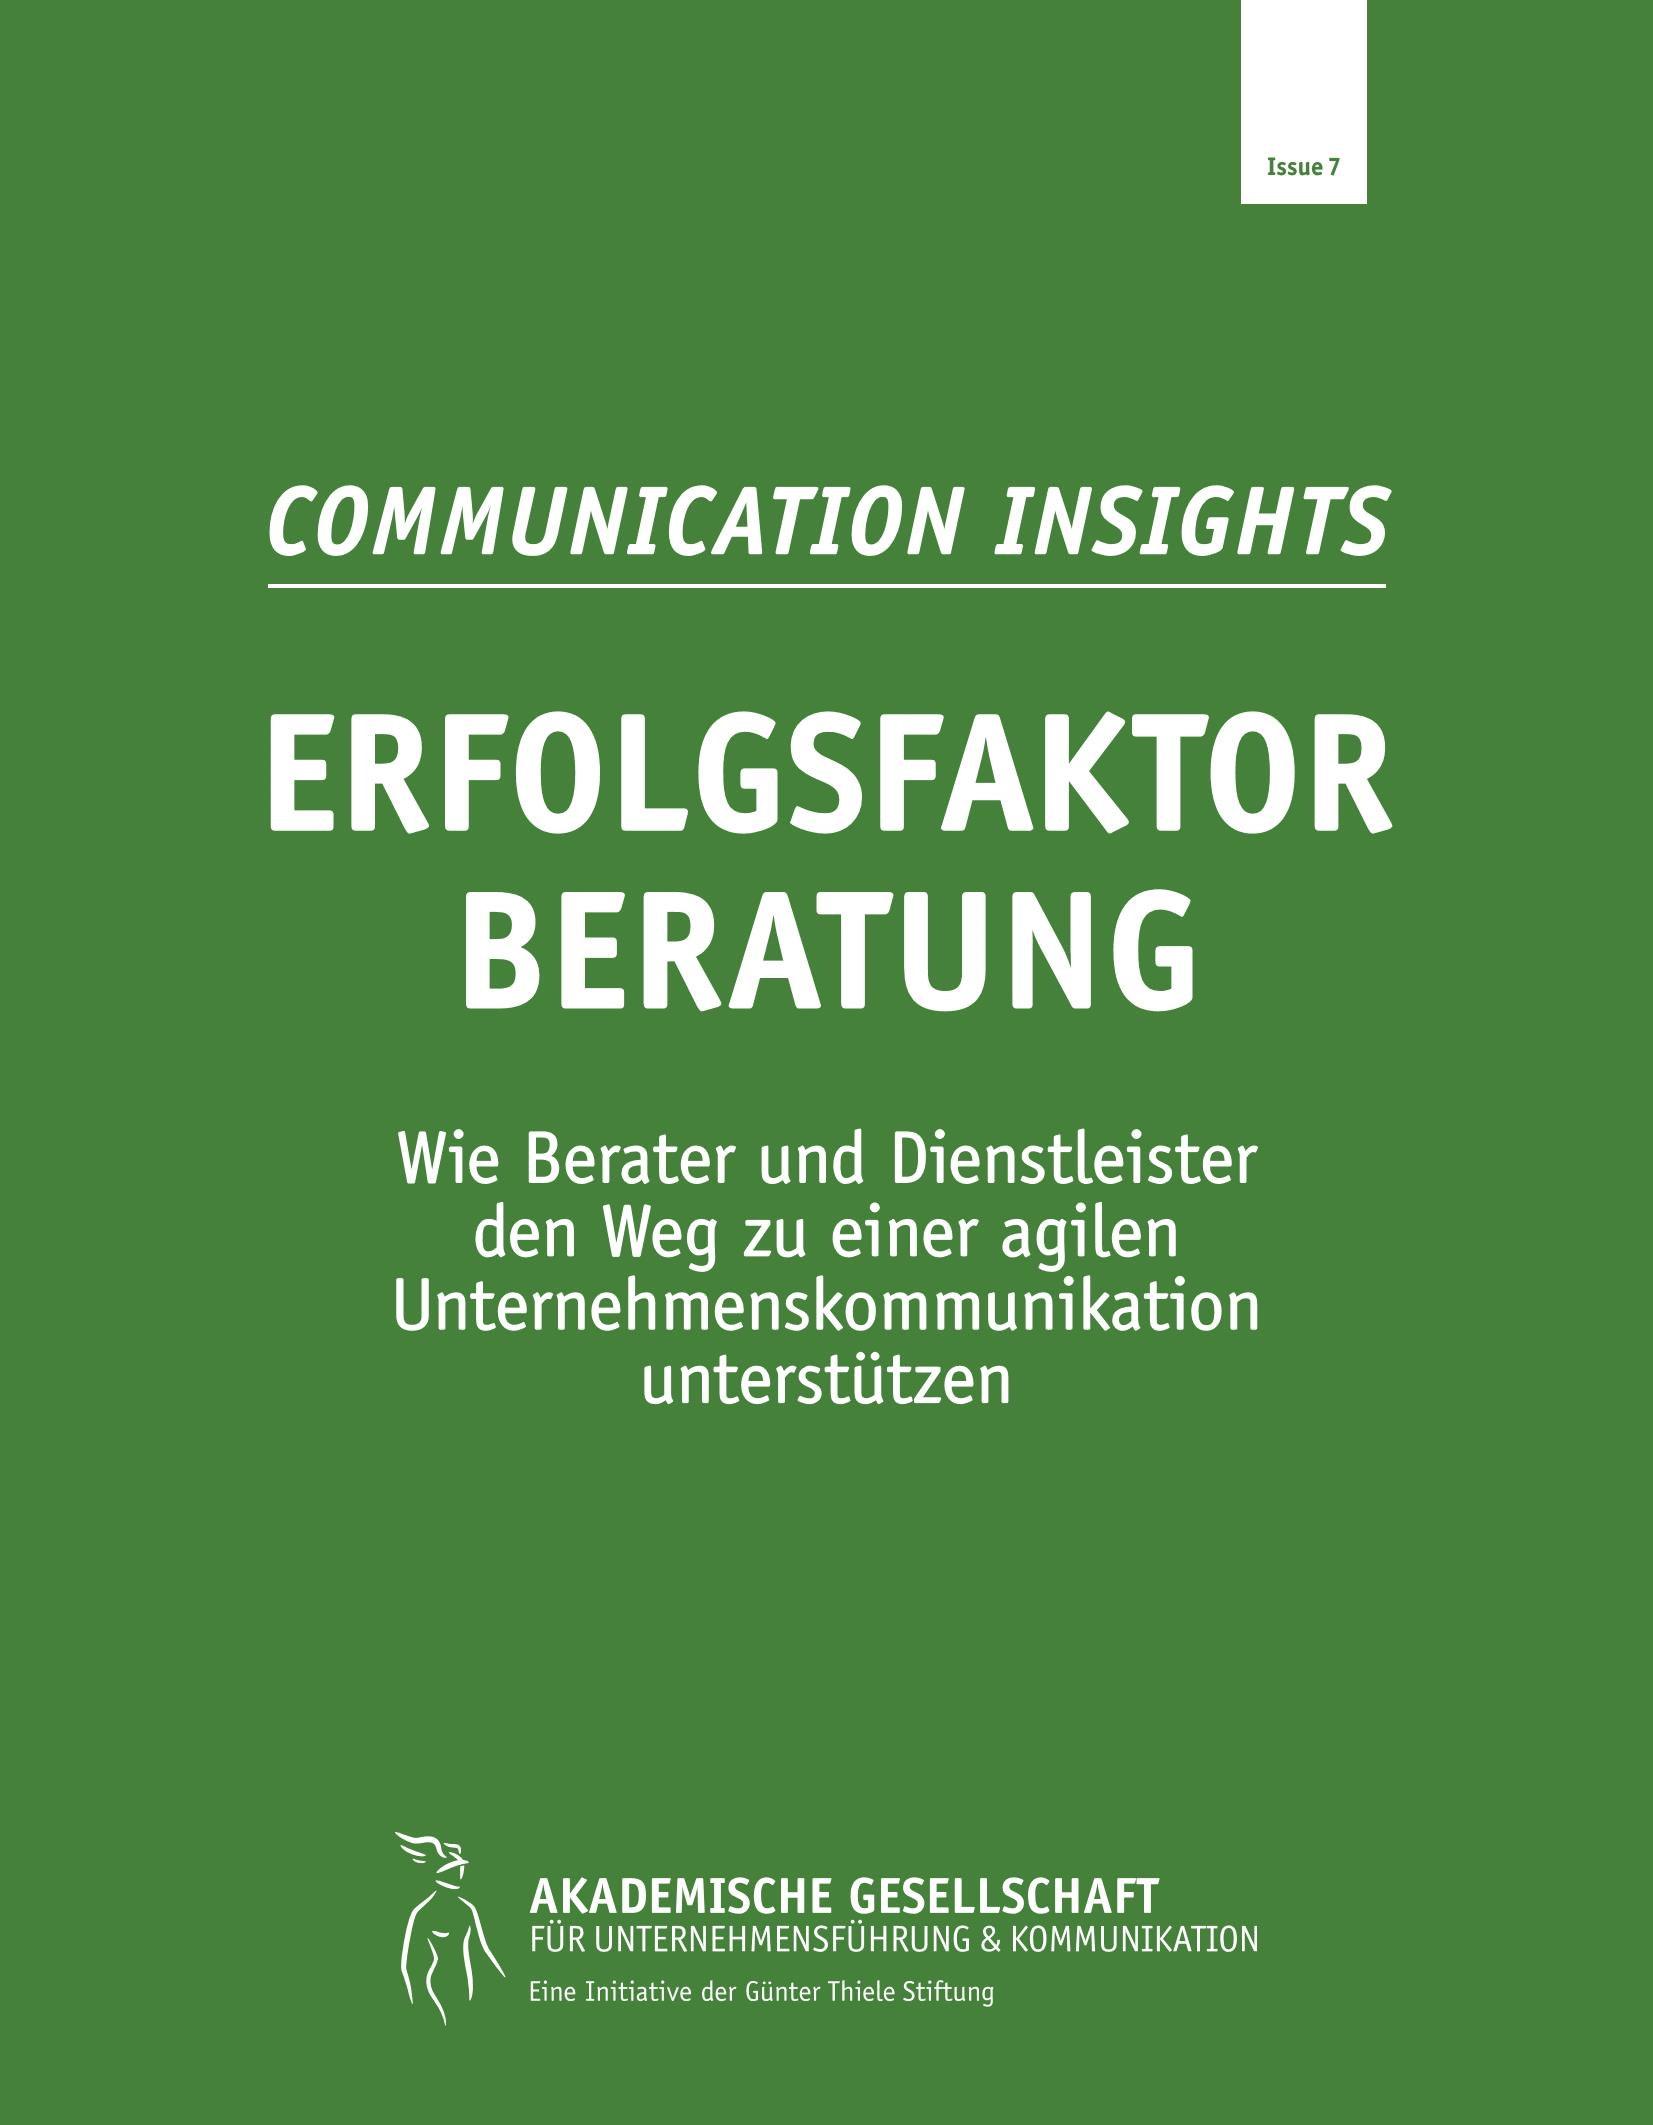 Communication Insights 7 Erfolgsfak Beratung AGUK Cover